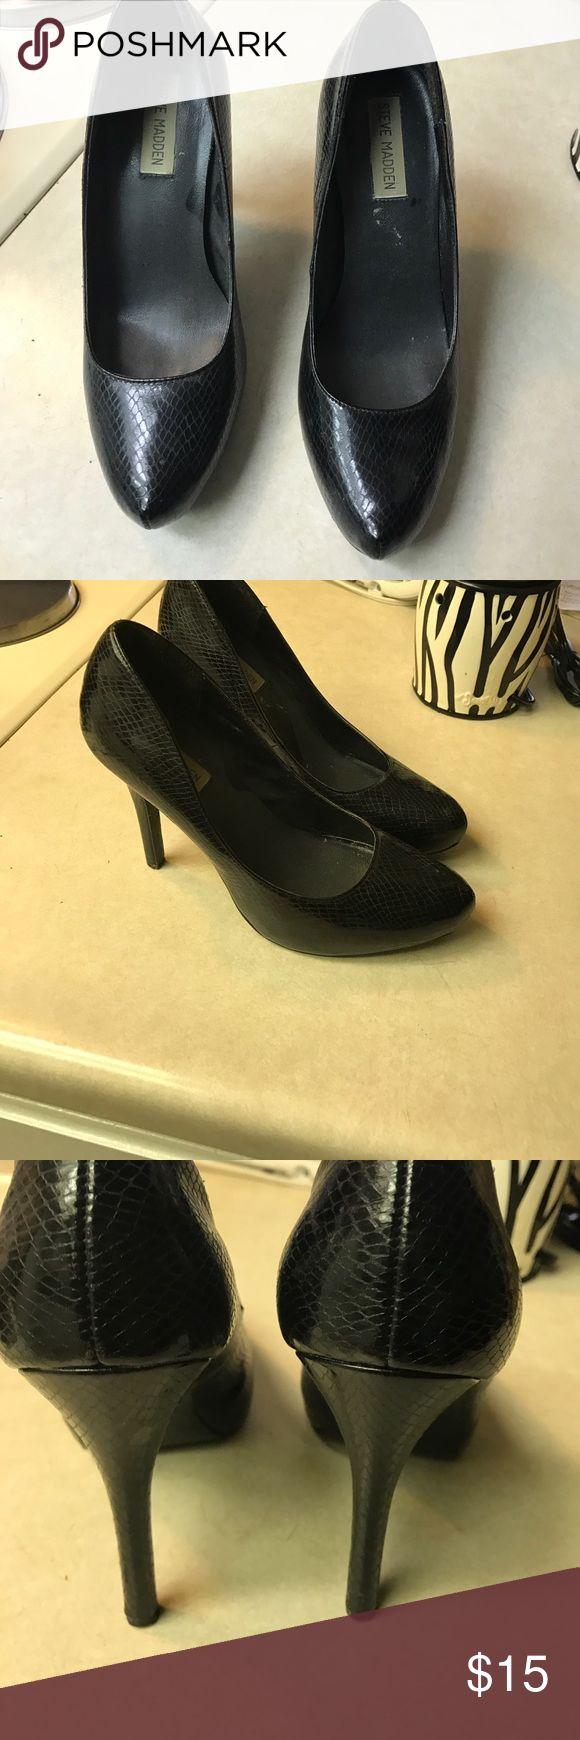 Steve Madden high heel Black Steve Madden high heels . Snake skin scale print . Good condition Steve Madden Shoes Heels